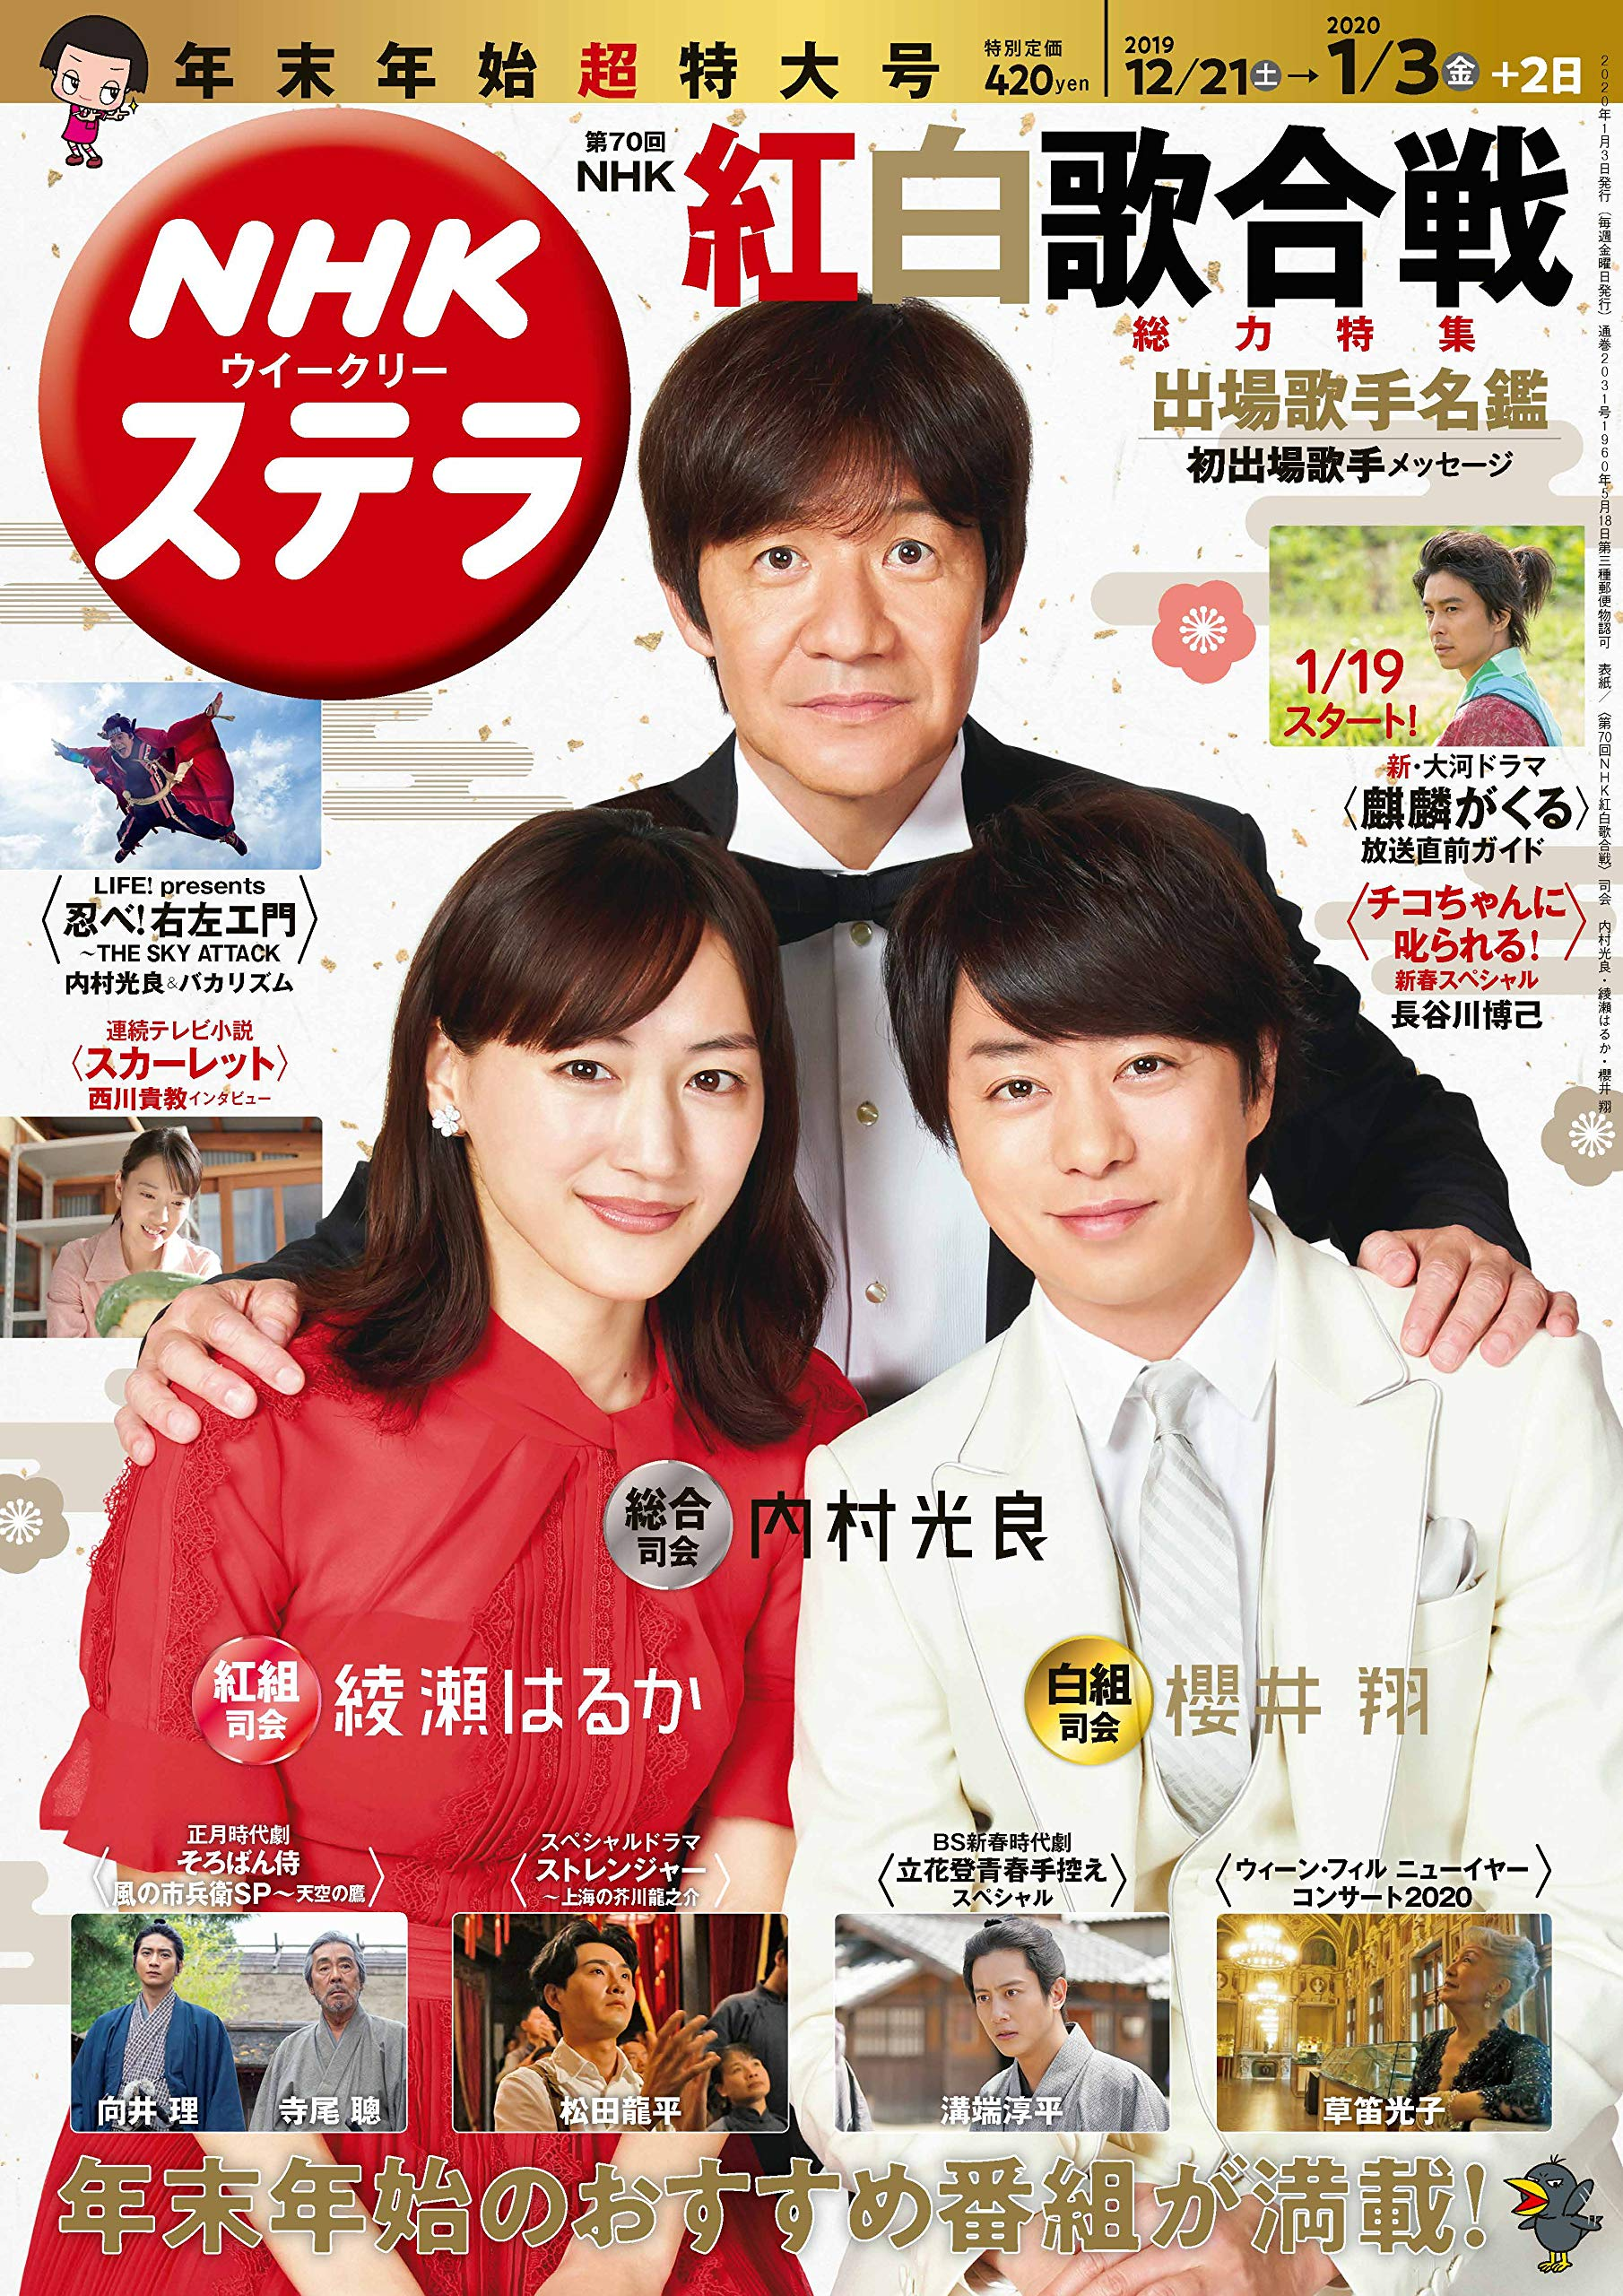 NHKウイークリーステラ 2020年 1/3号